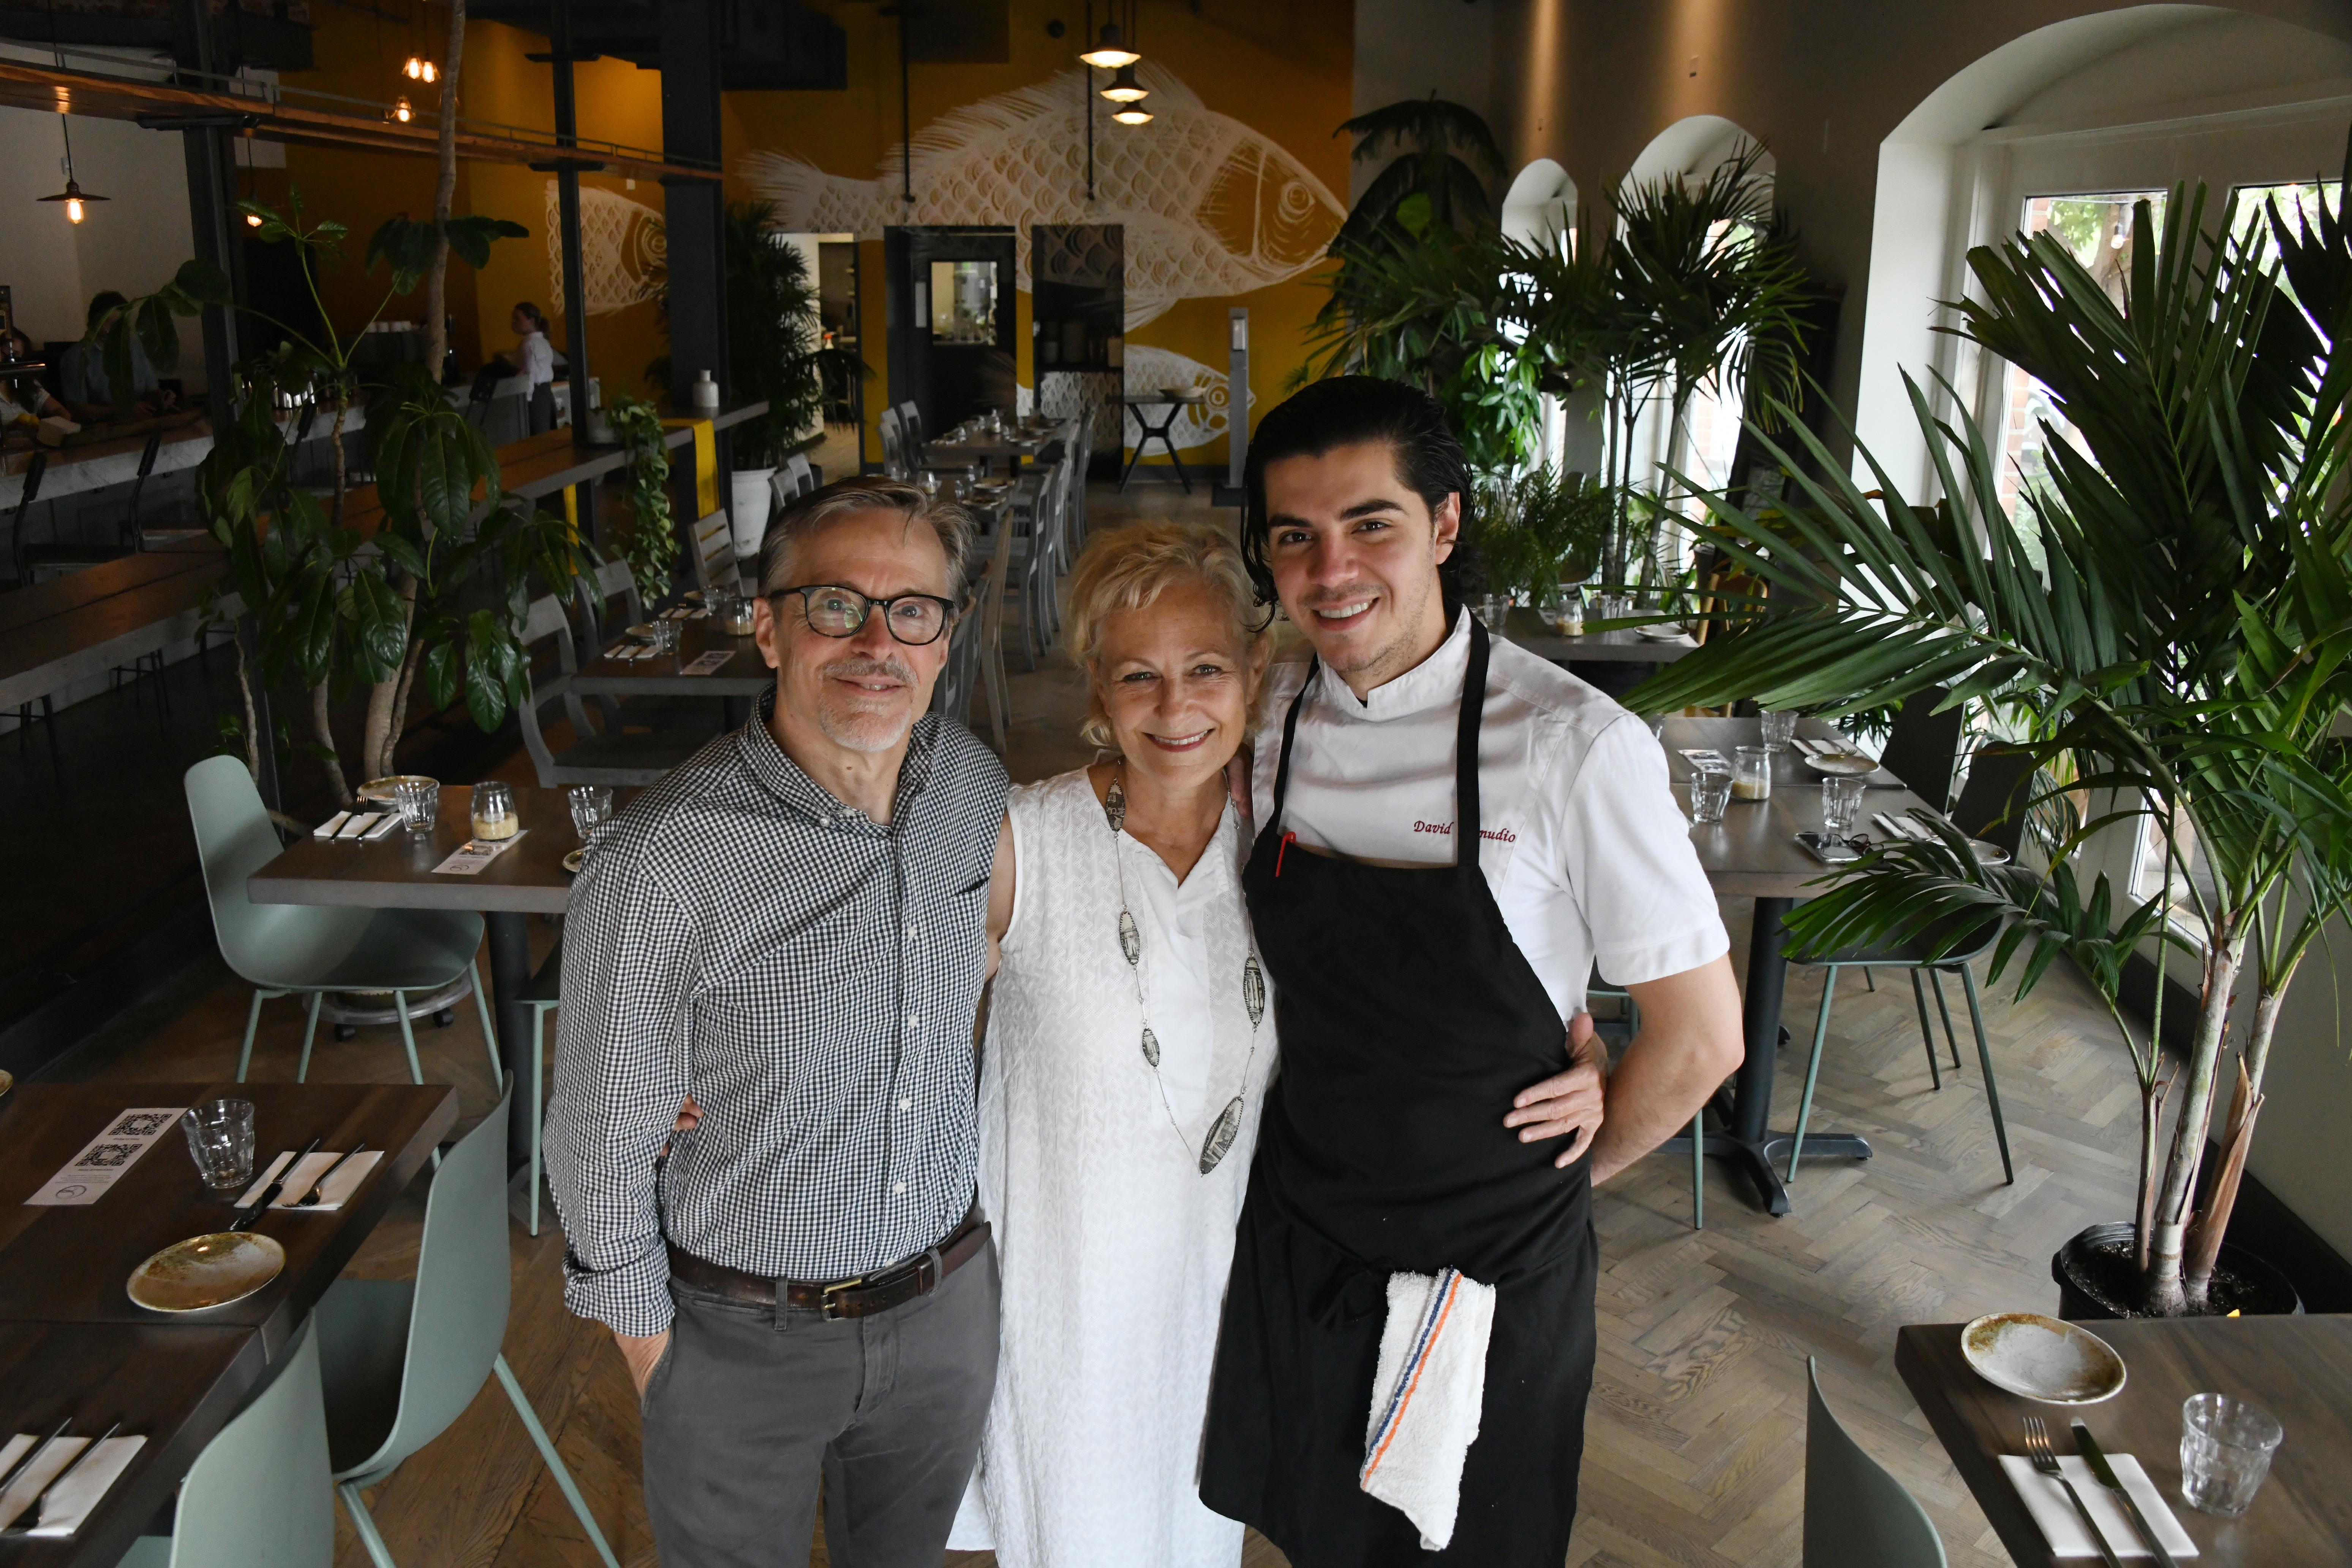 Alma Cocina Latina brings a taste of Venezuela to Baltimore by sponsoring chefs for visa program